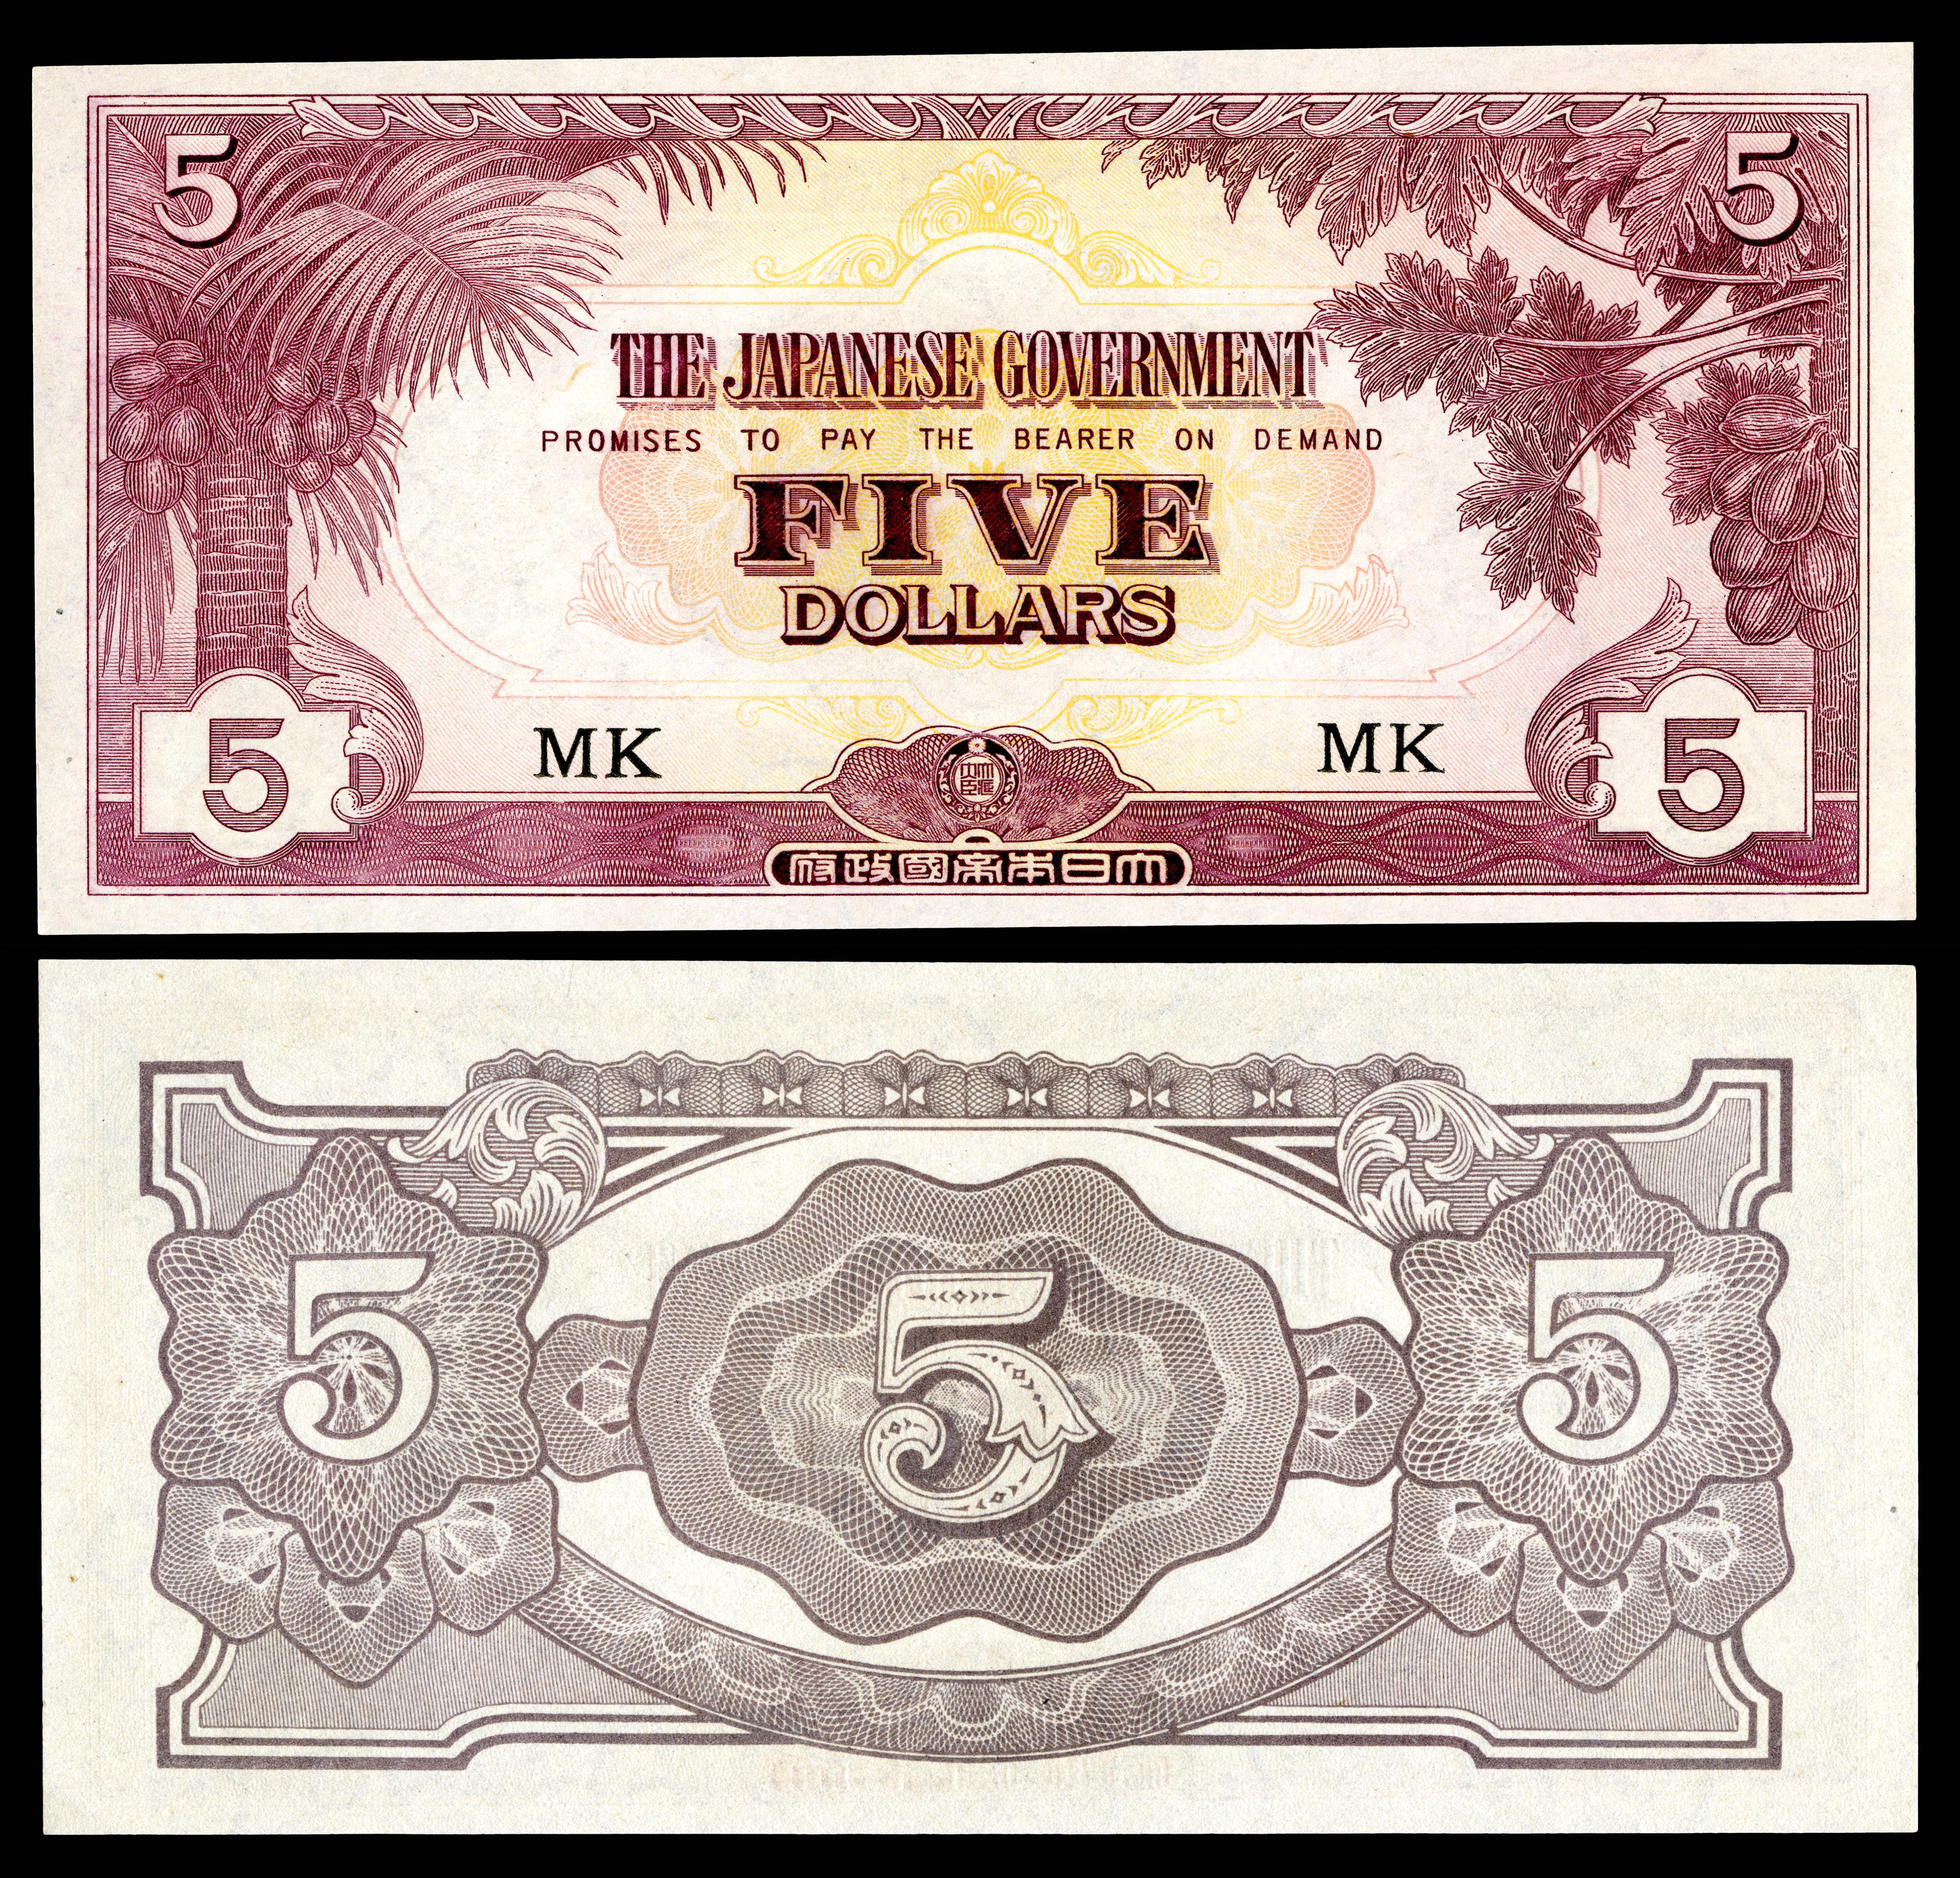 Japanese government issued dollar in malaya and borneo wikipedia mal m6c malaya japanese occupation five dollars nd 1942 biocorpaavc